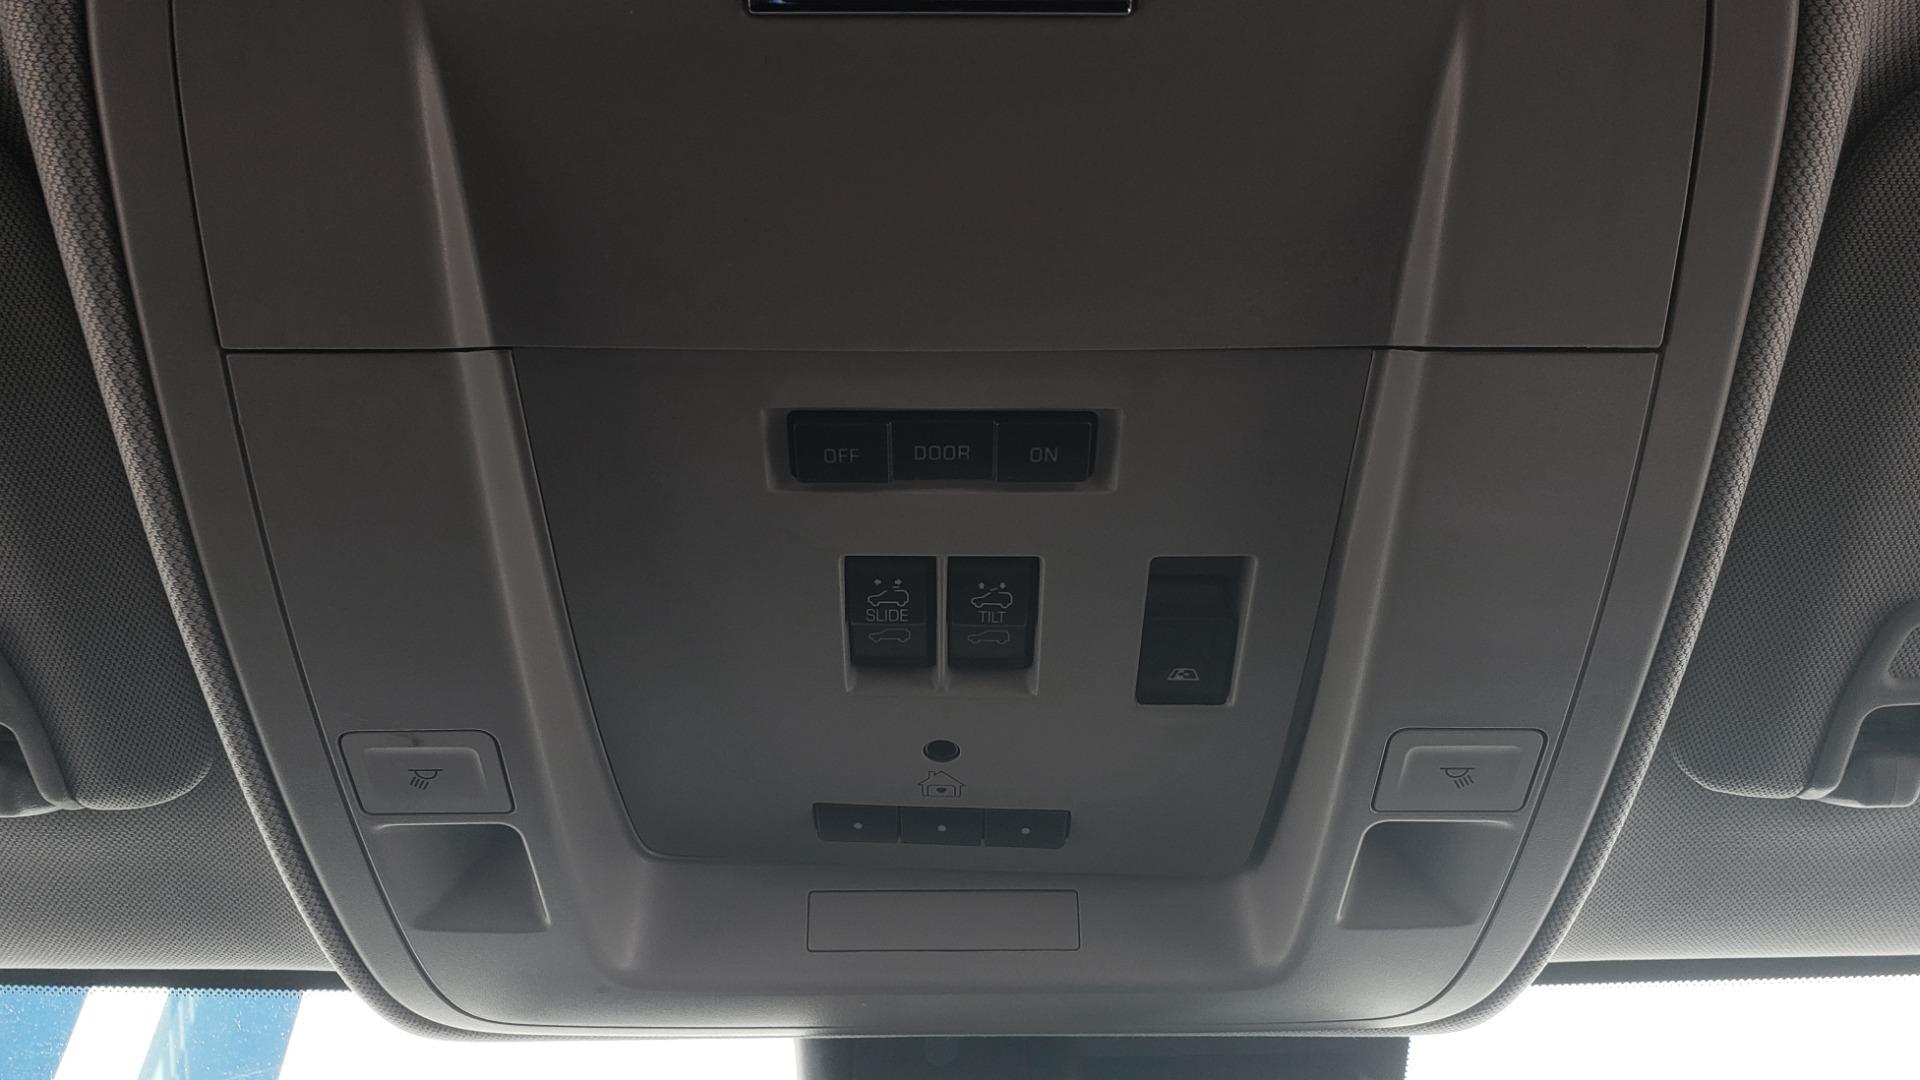 Used 2015 GMC SIERRA 2500HD DENALI 4WD CREWCAB / 6.6L DURAMAX / 6-SPD AUTO / NAV / BOSE for sale $50,995 at Formula Imports in Charlotte NC 28227 66